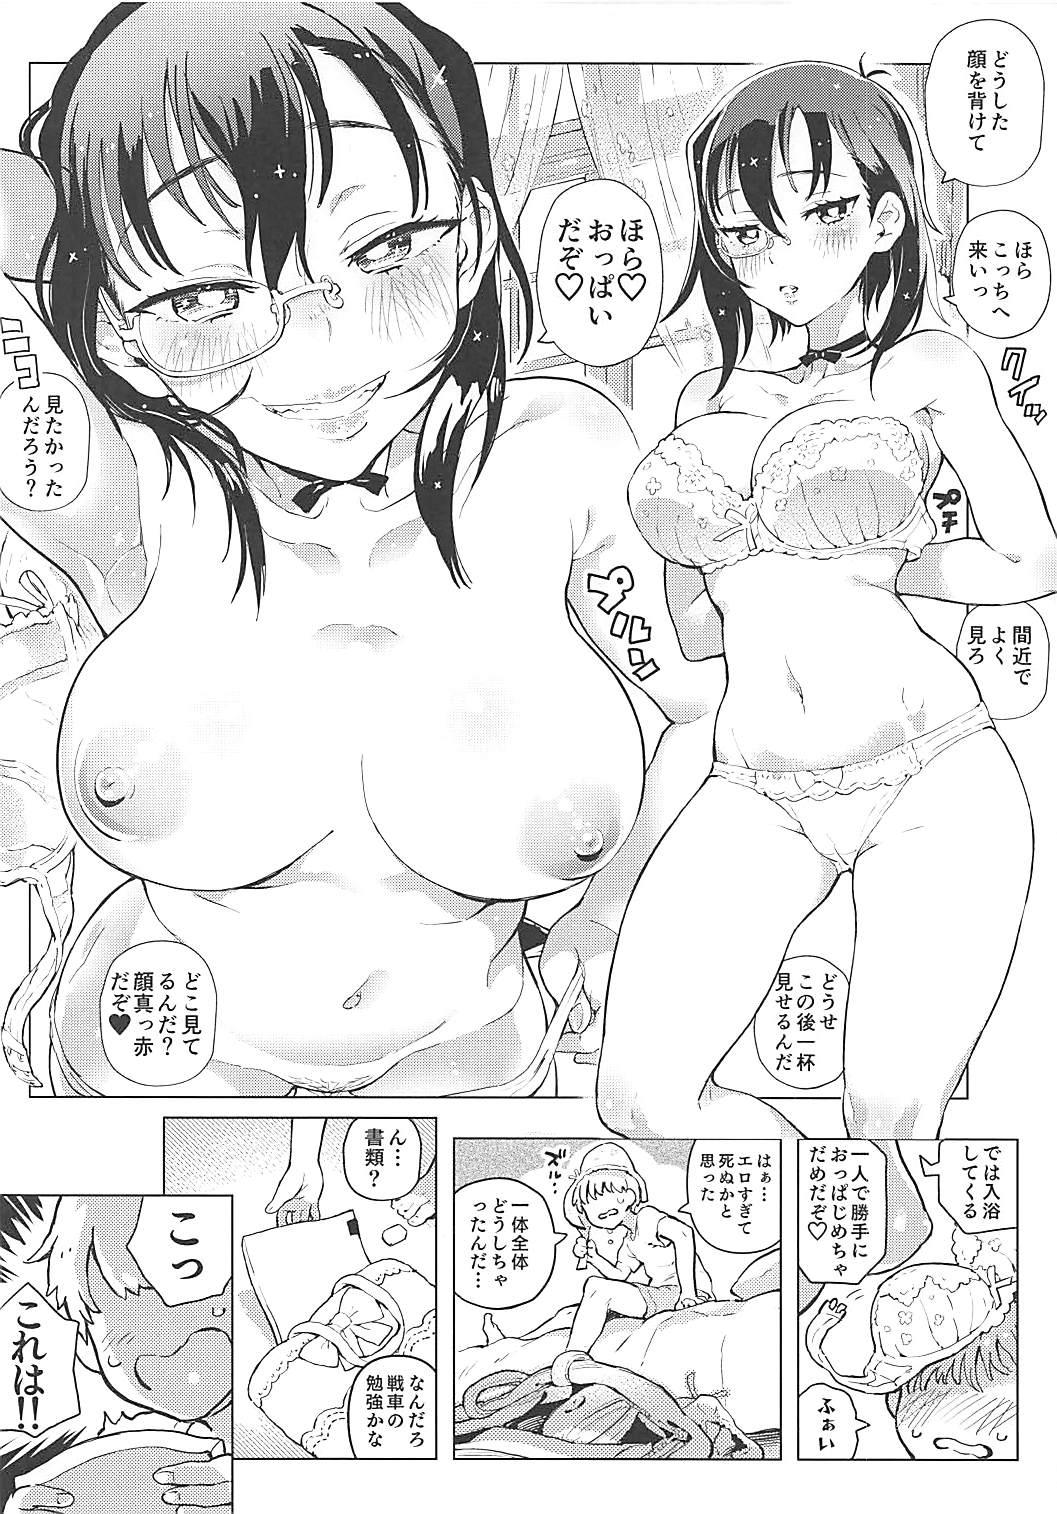 (Panzer Vor! 15) [Norinko] momon 2018-05 Hisshou Momo-chan Senpai no Perfect Date Plan (Girls und Panzer) 3